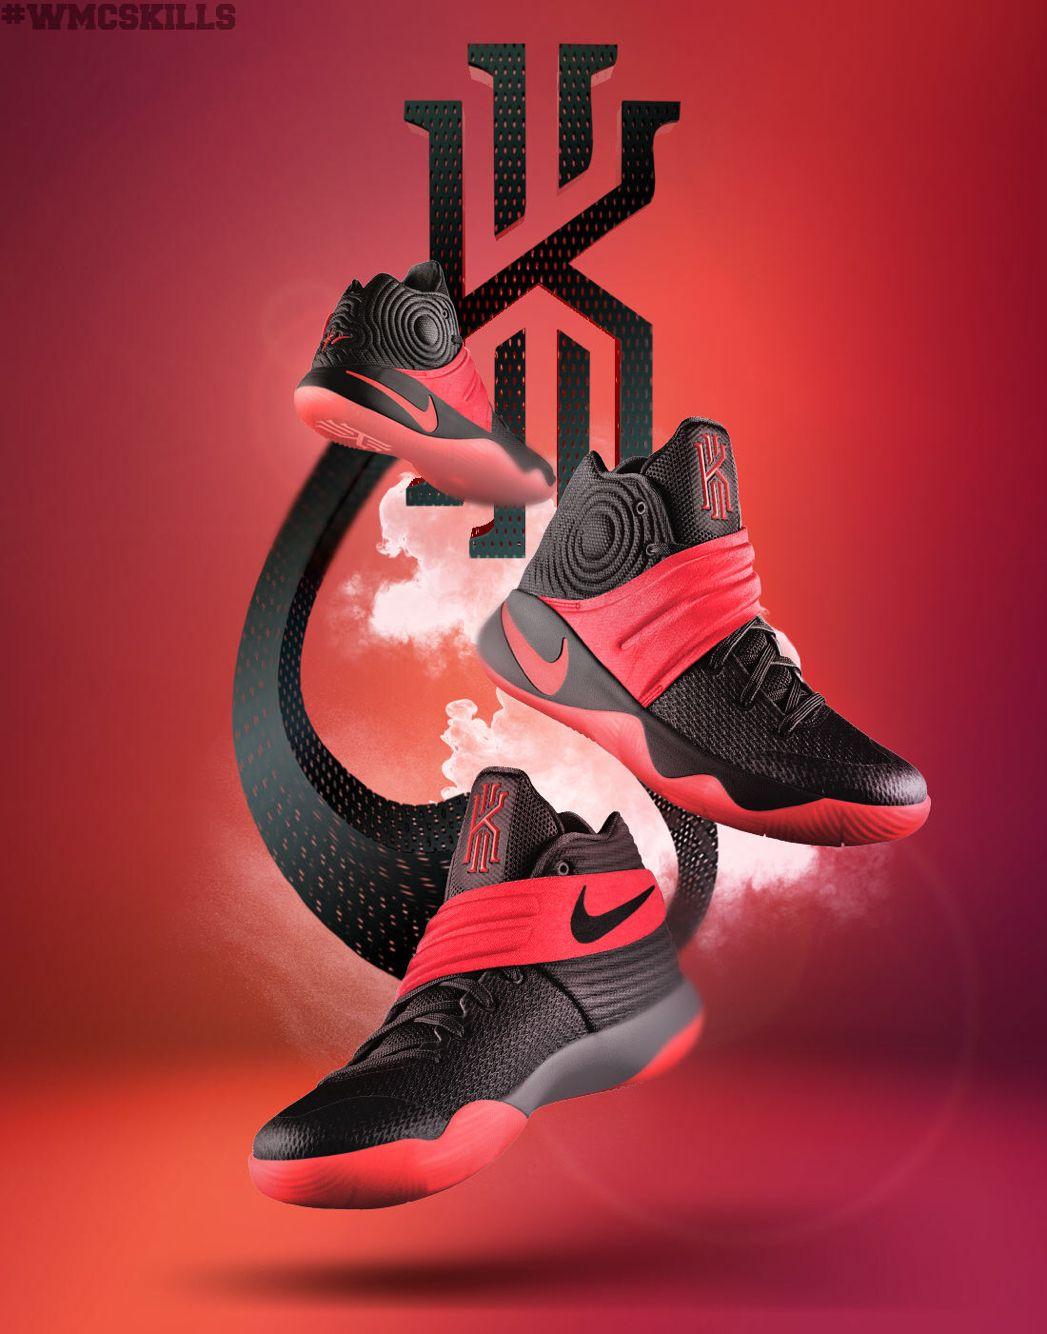 Kyrie Irving basketball sneakers. Nike #wmcskills | Sneaker ...